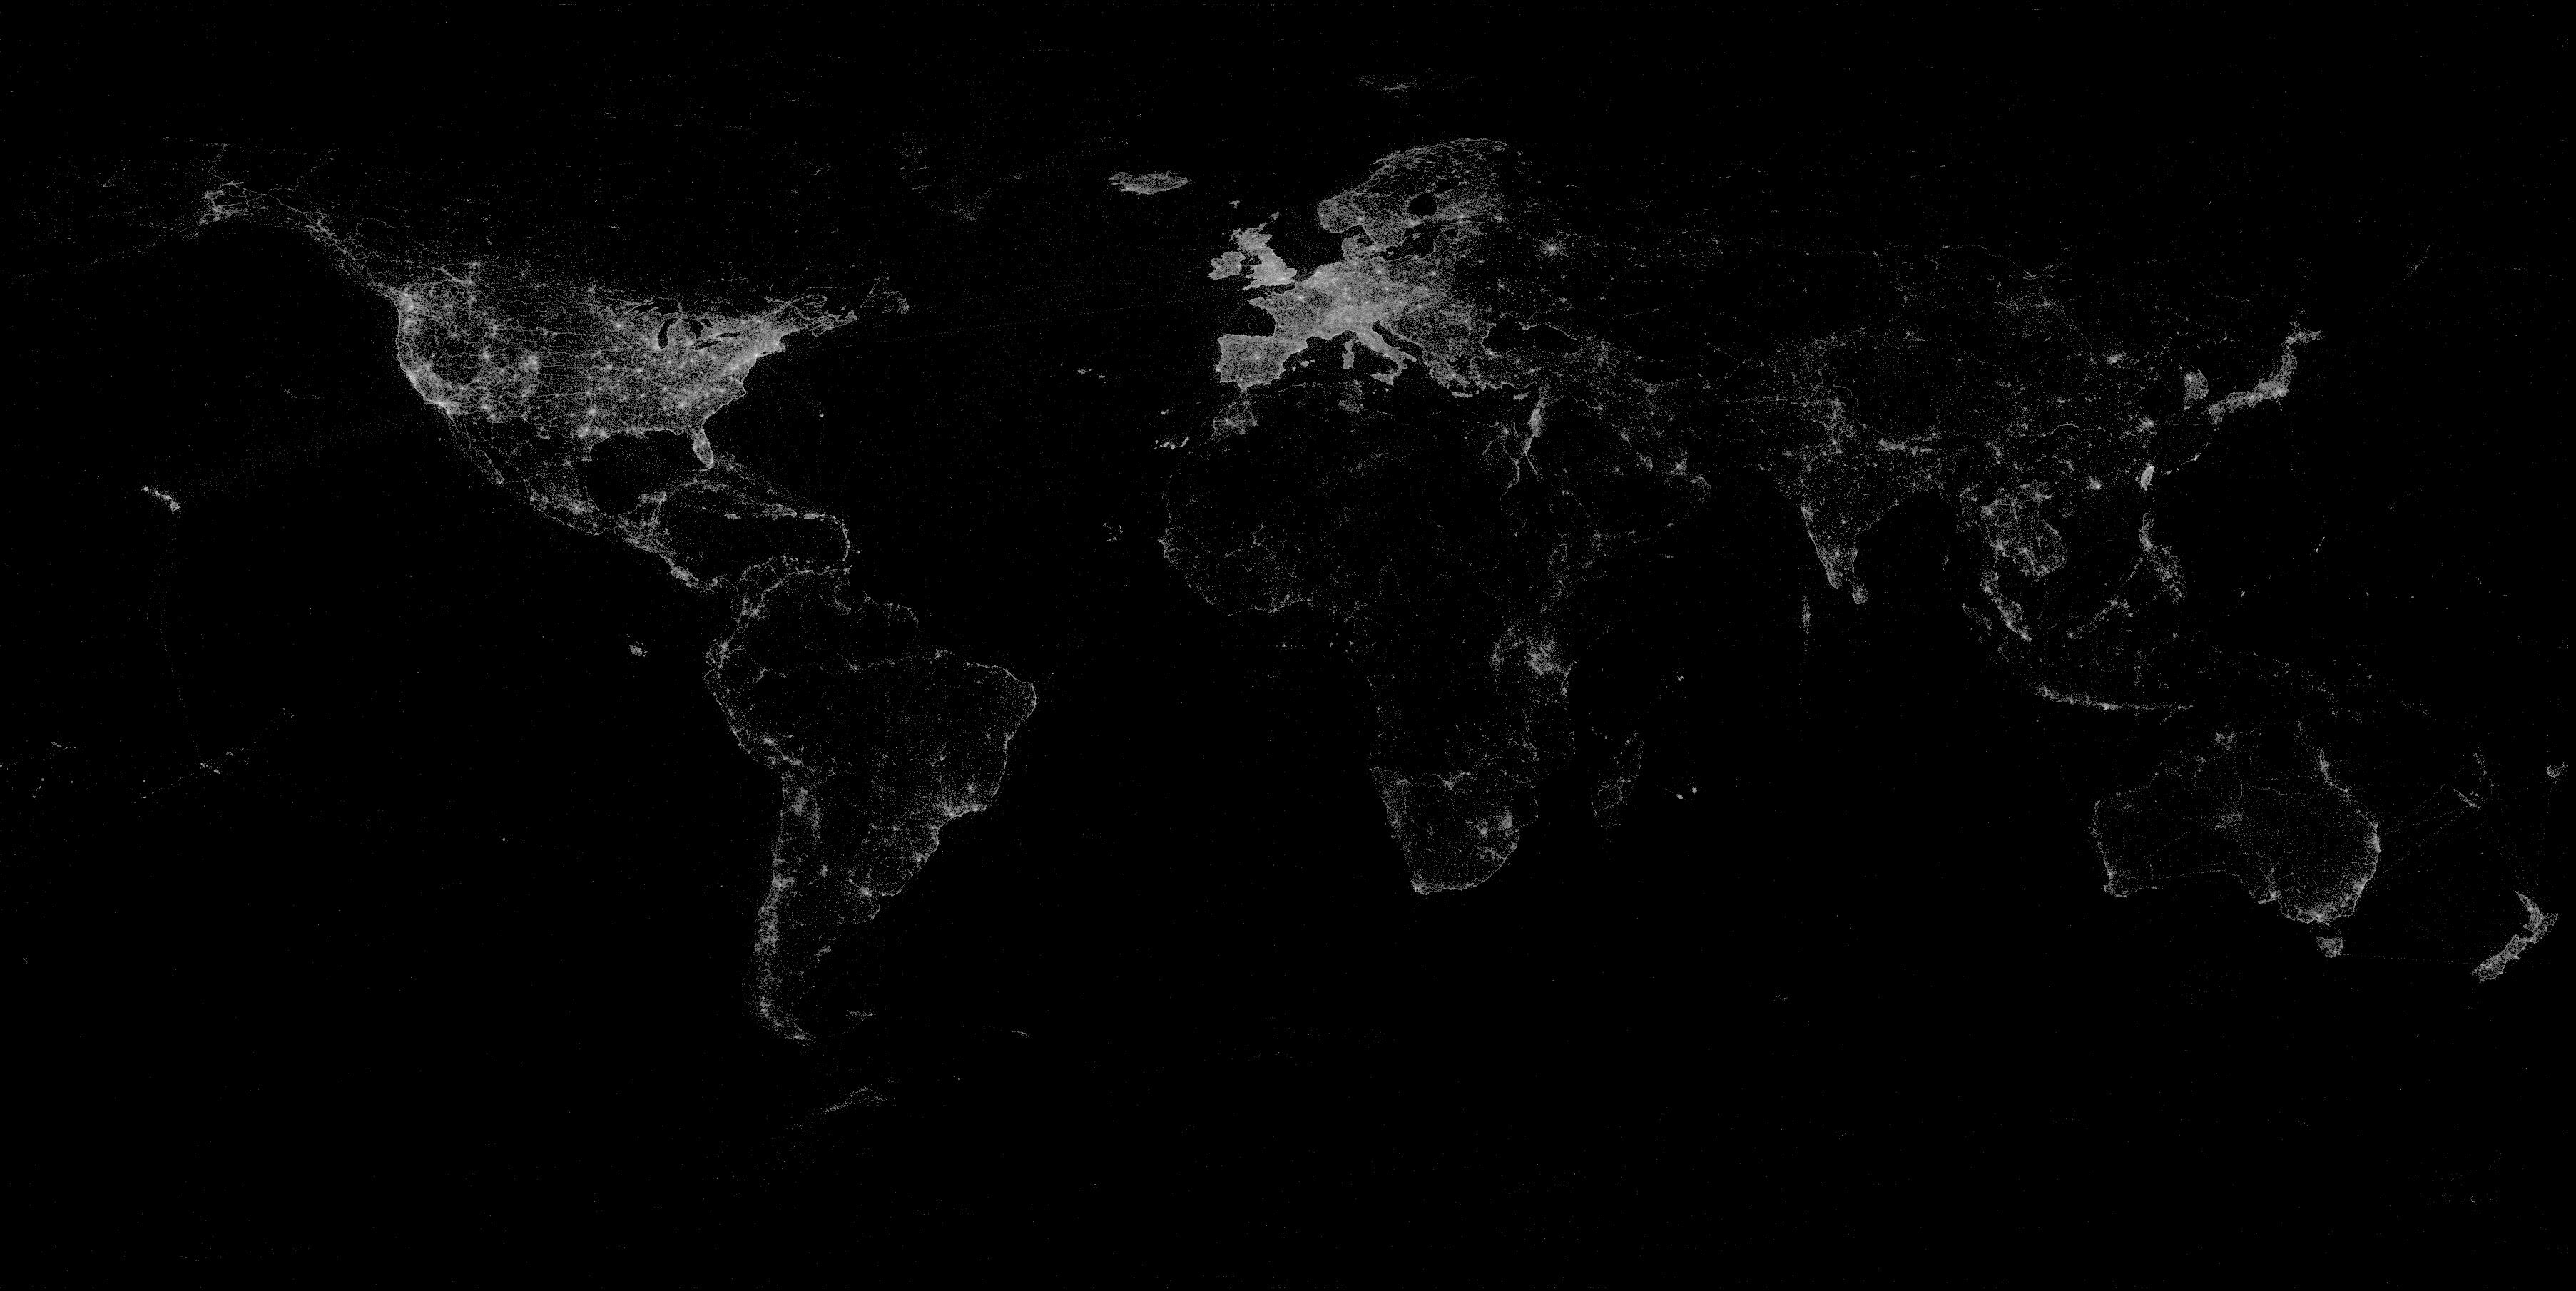 Dark world map wallpaper hd media file pixelstalk view image larger and download gumiabroncs Choice Image